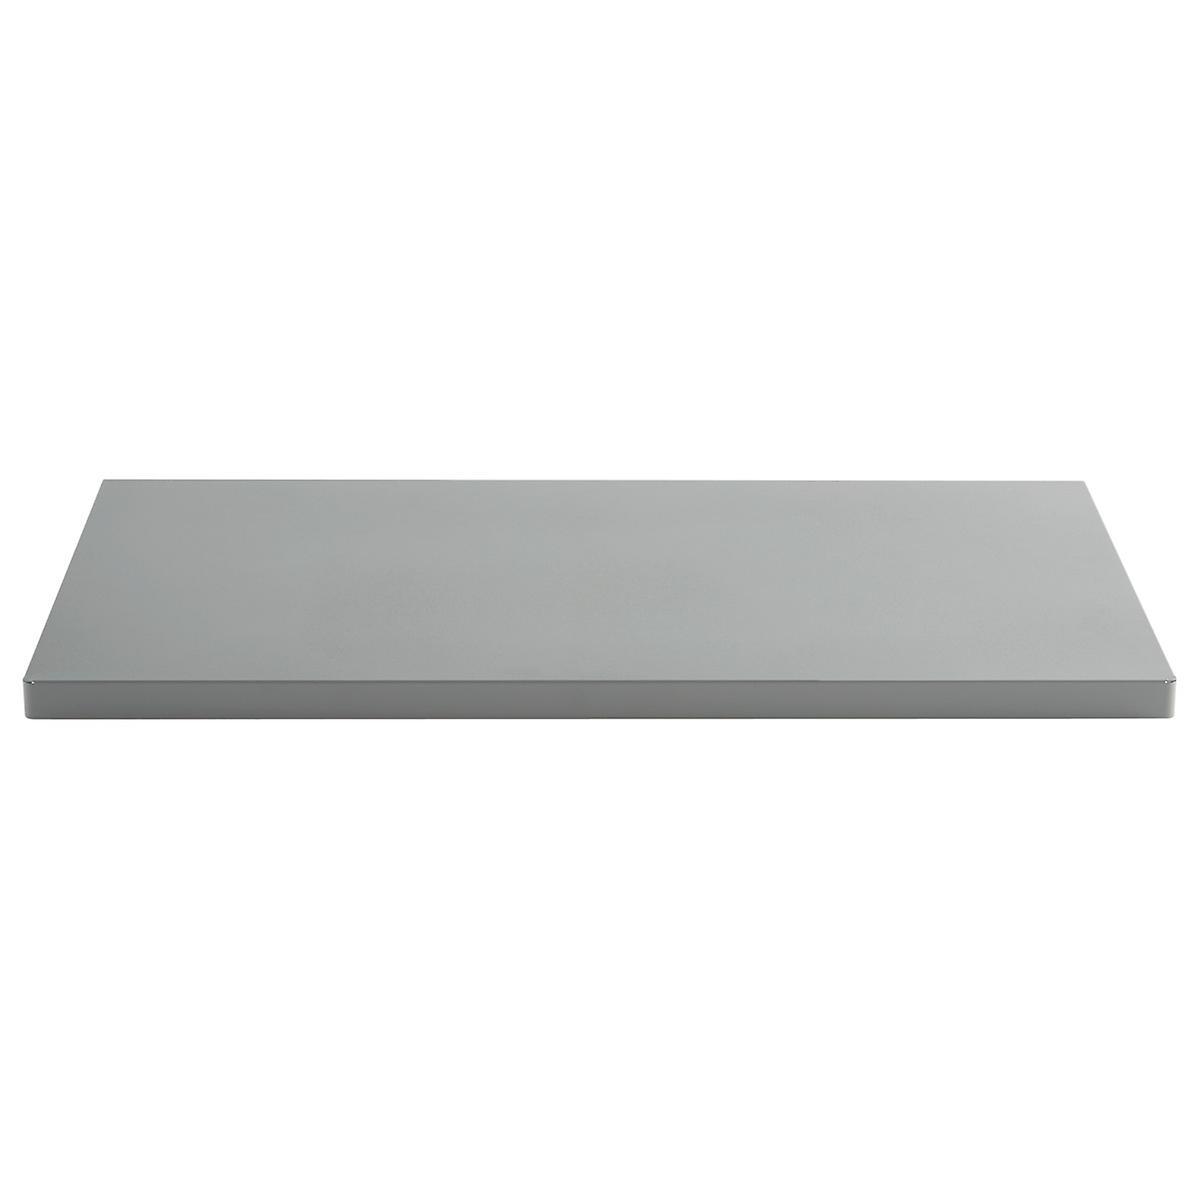 Grey Elfa Utility Work Surface